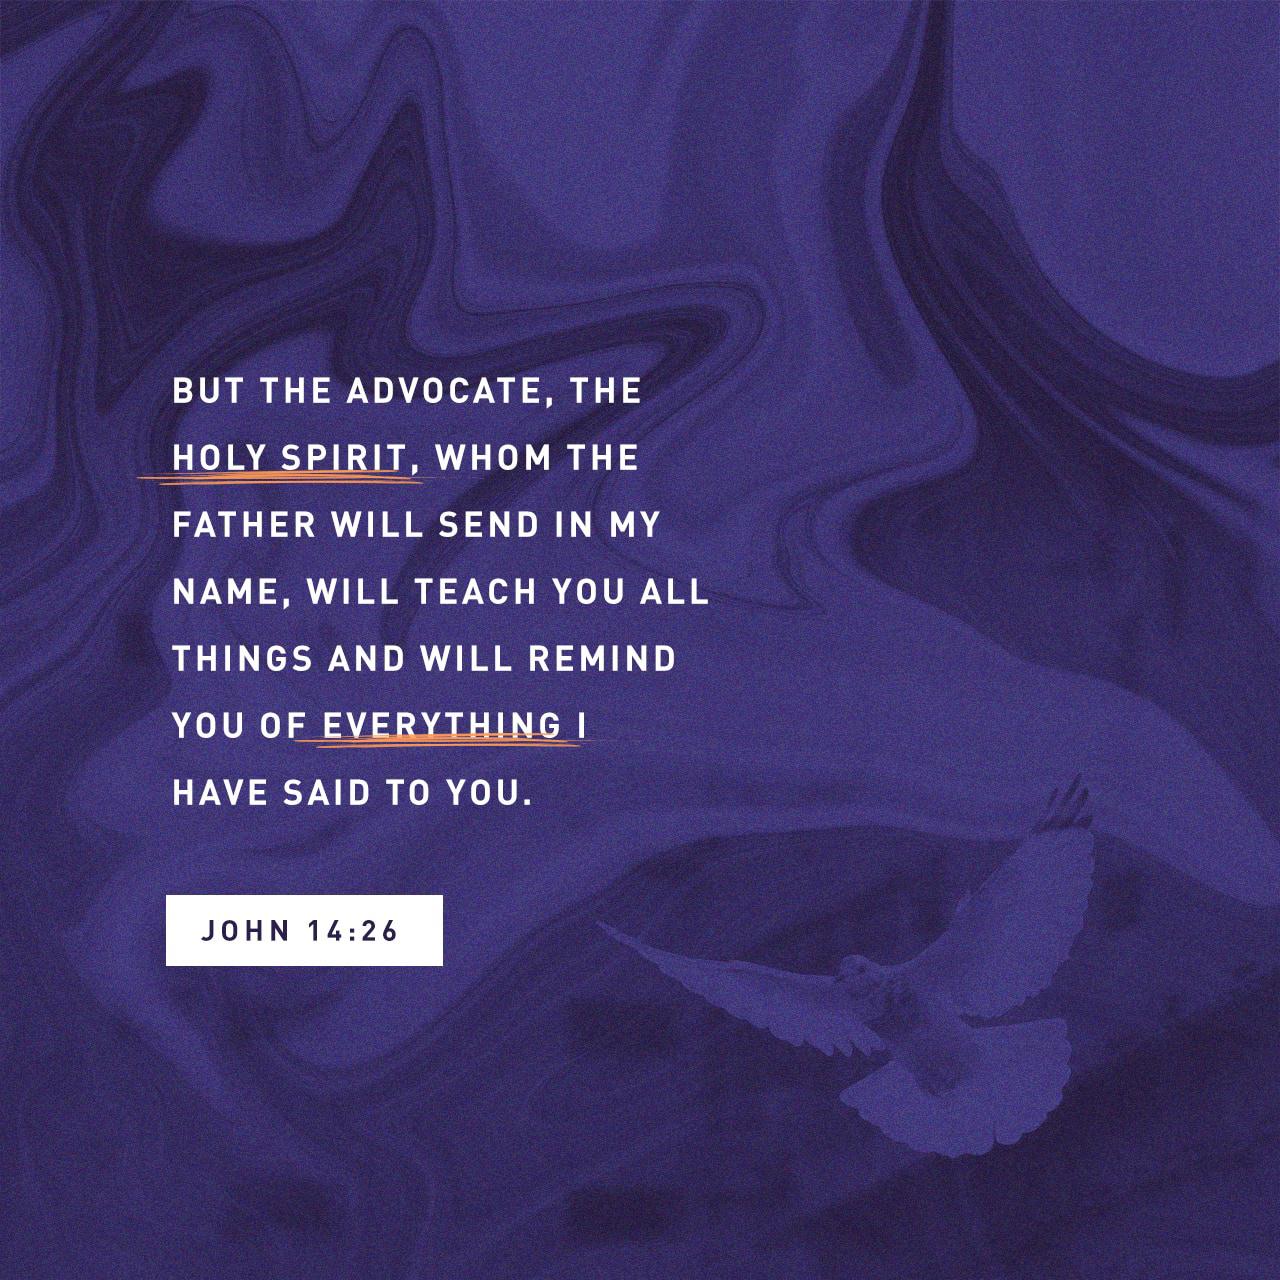 John 14 26 Ampc Holy Spirit Bible Apps Verses